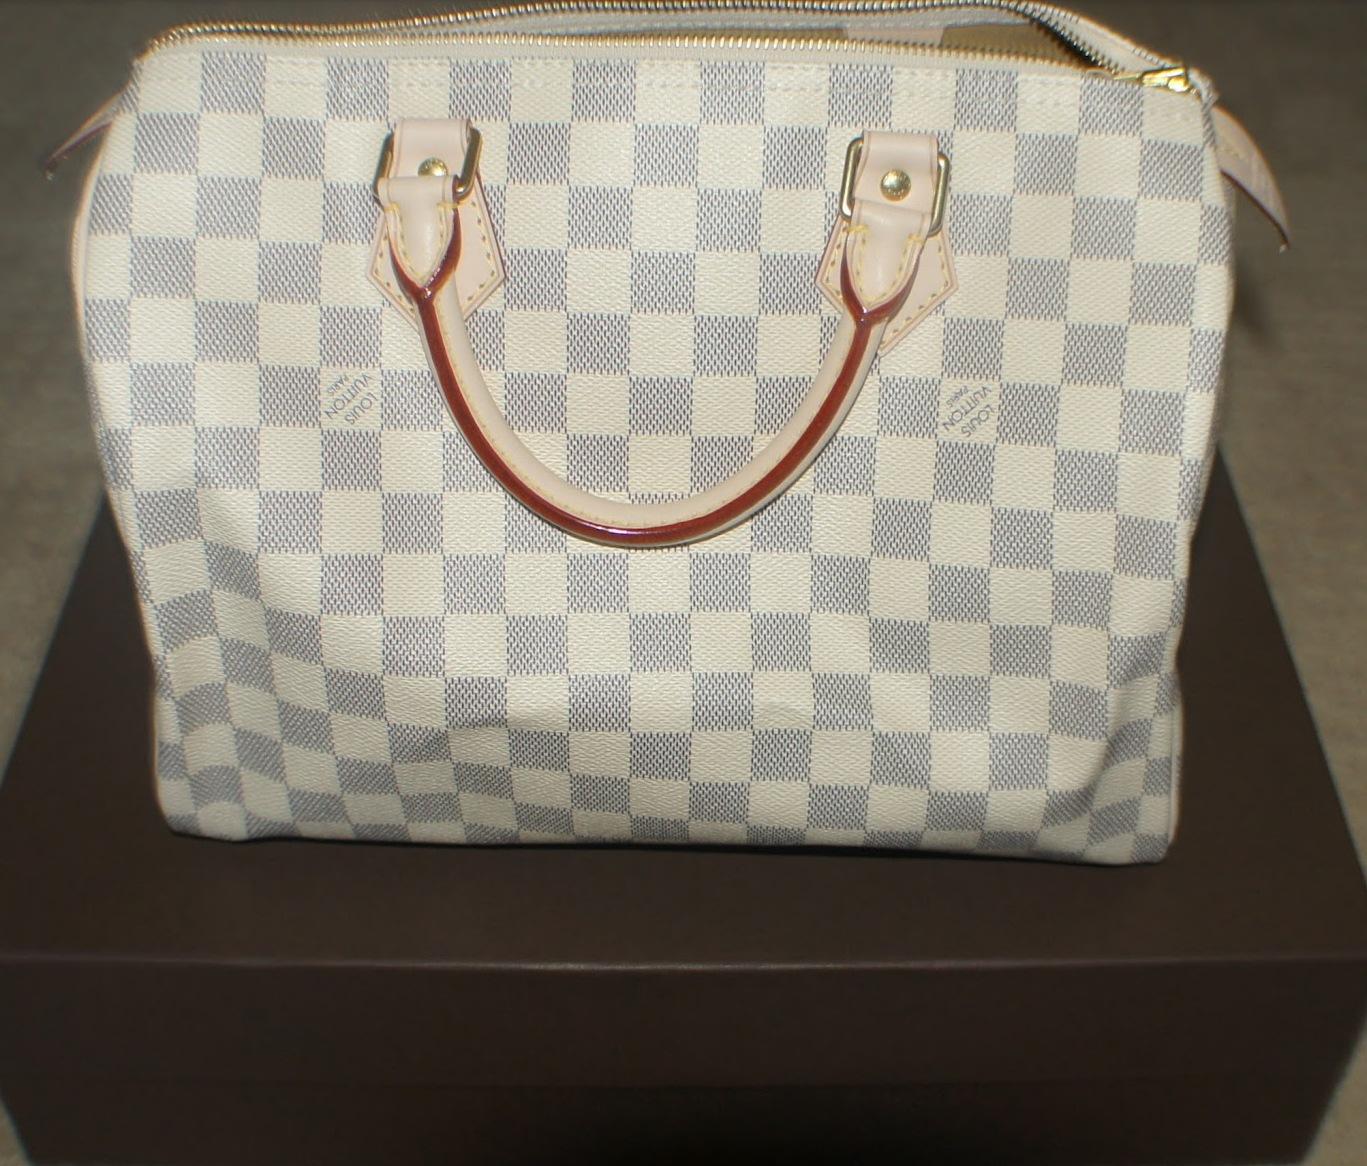 A Review of the Louis Vuitton Speedy 30 8714d11c03cea